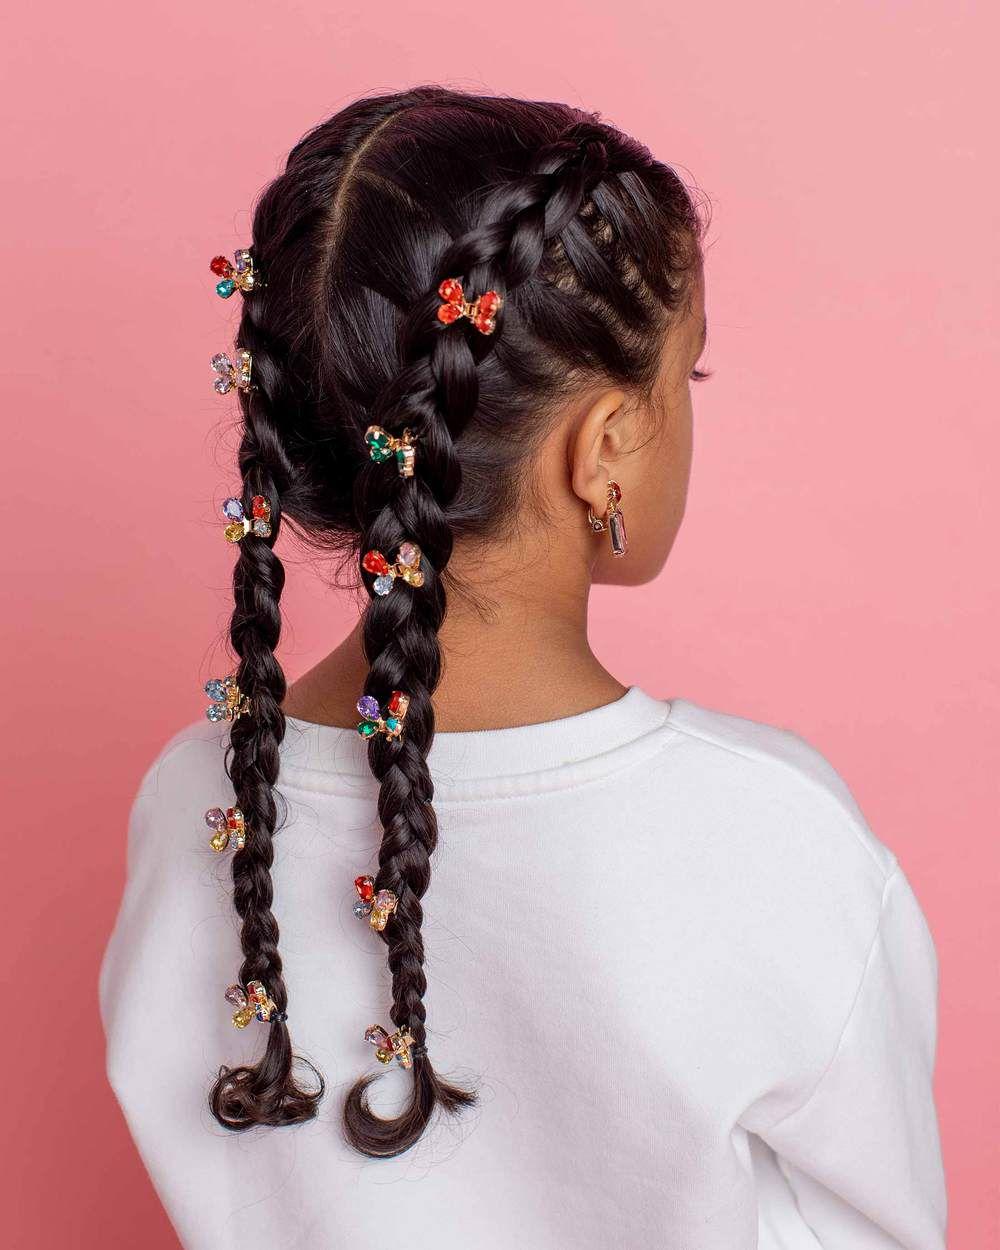 Super Smalls hair clips